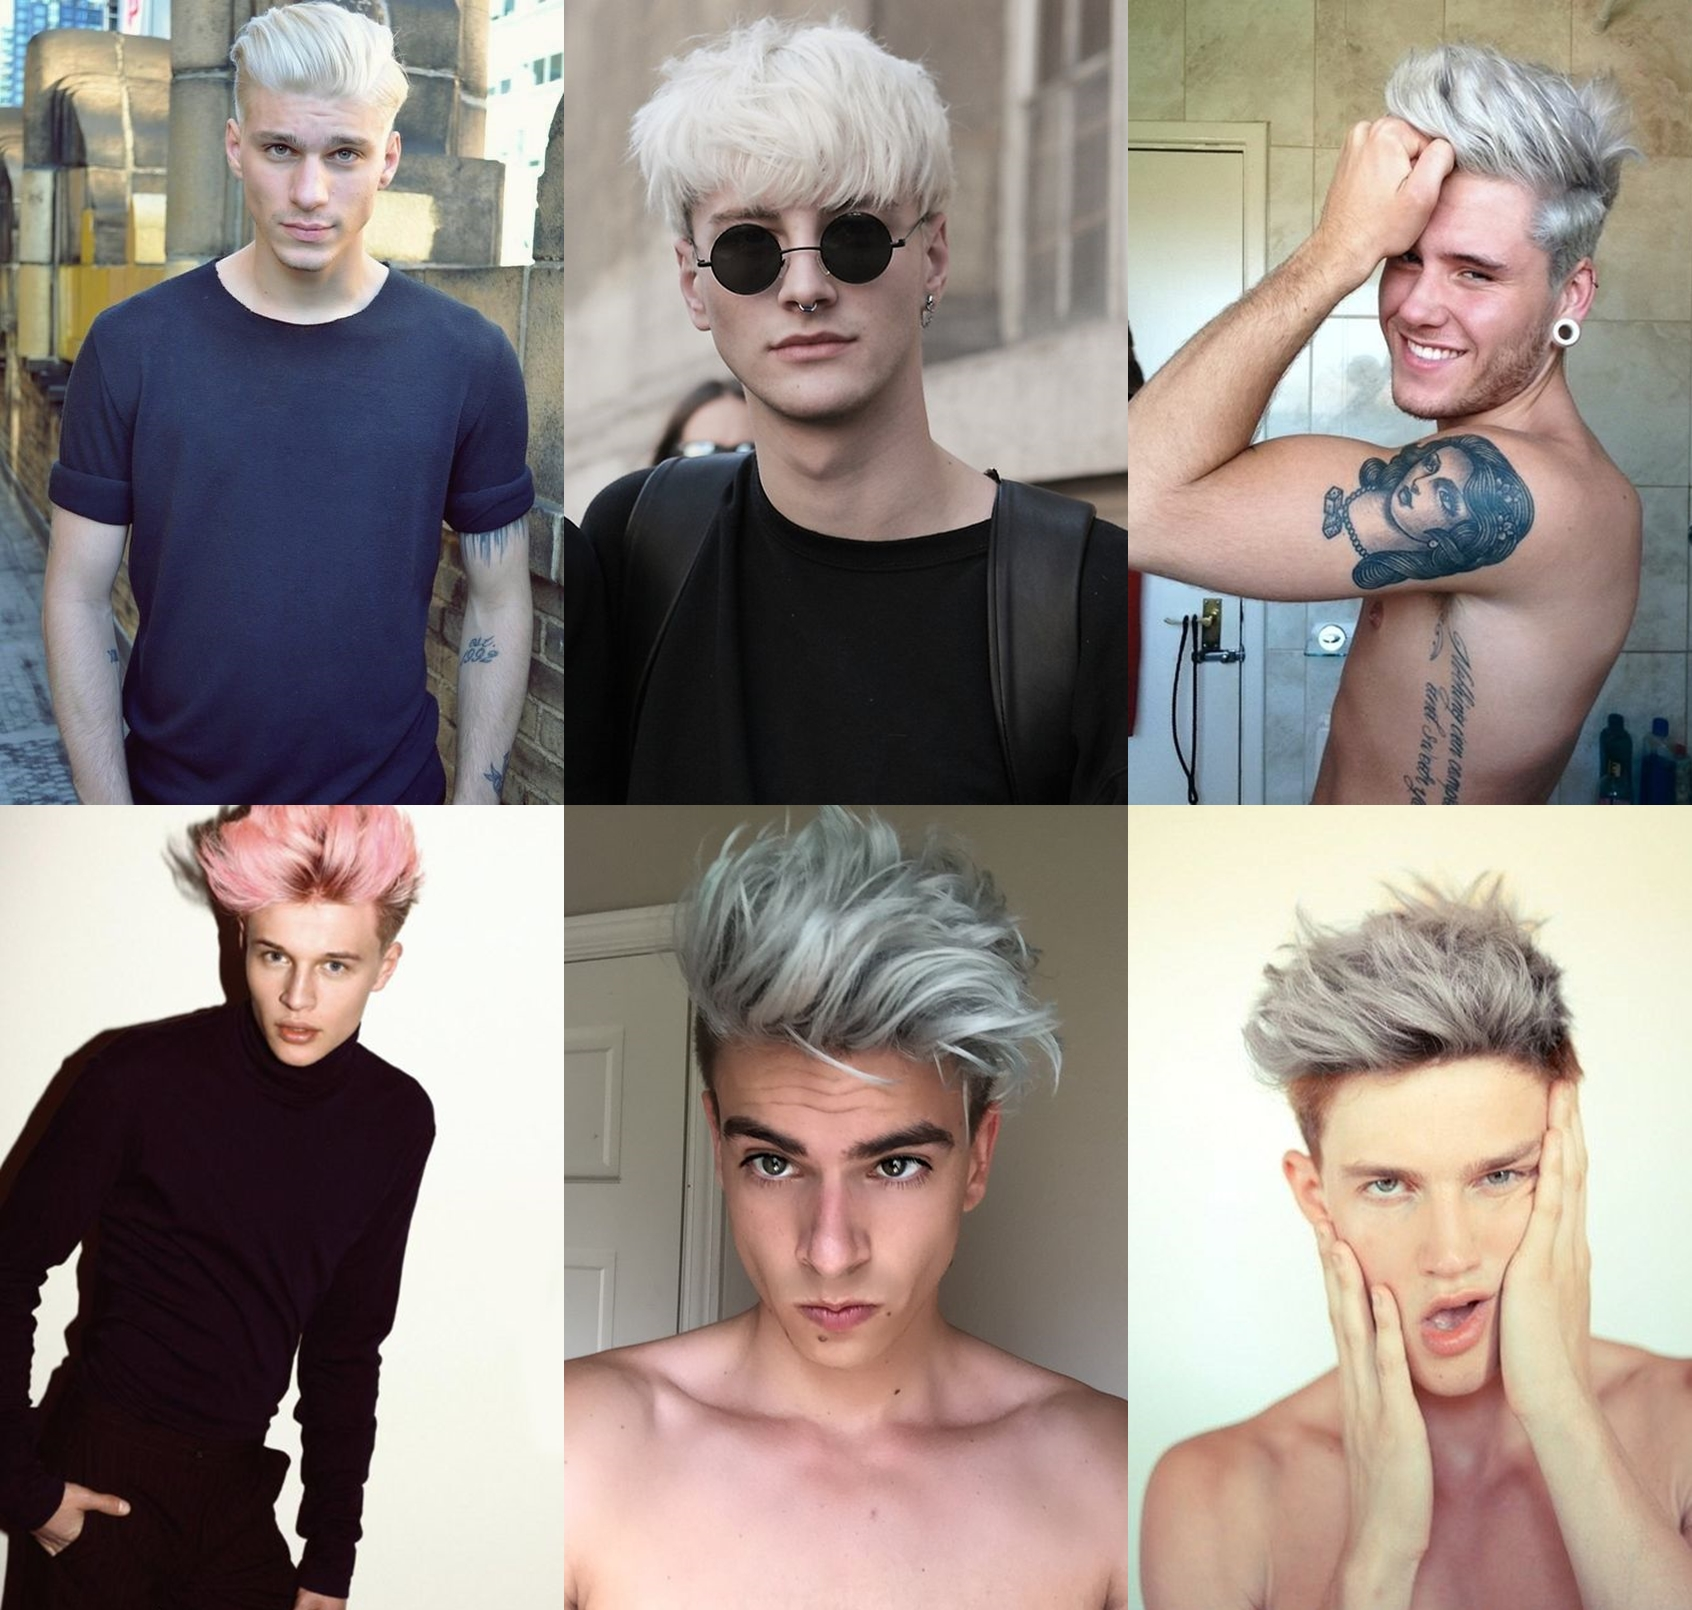 cabelo platinado, platinado masculino, cabelo masculino, corte masculino, penteados 2016, cortes 2016, menswear, moda masculina, fashion blogger, menswear, style, estilo, alex cursino, moda sem censura, 3